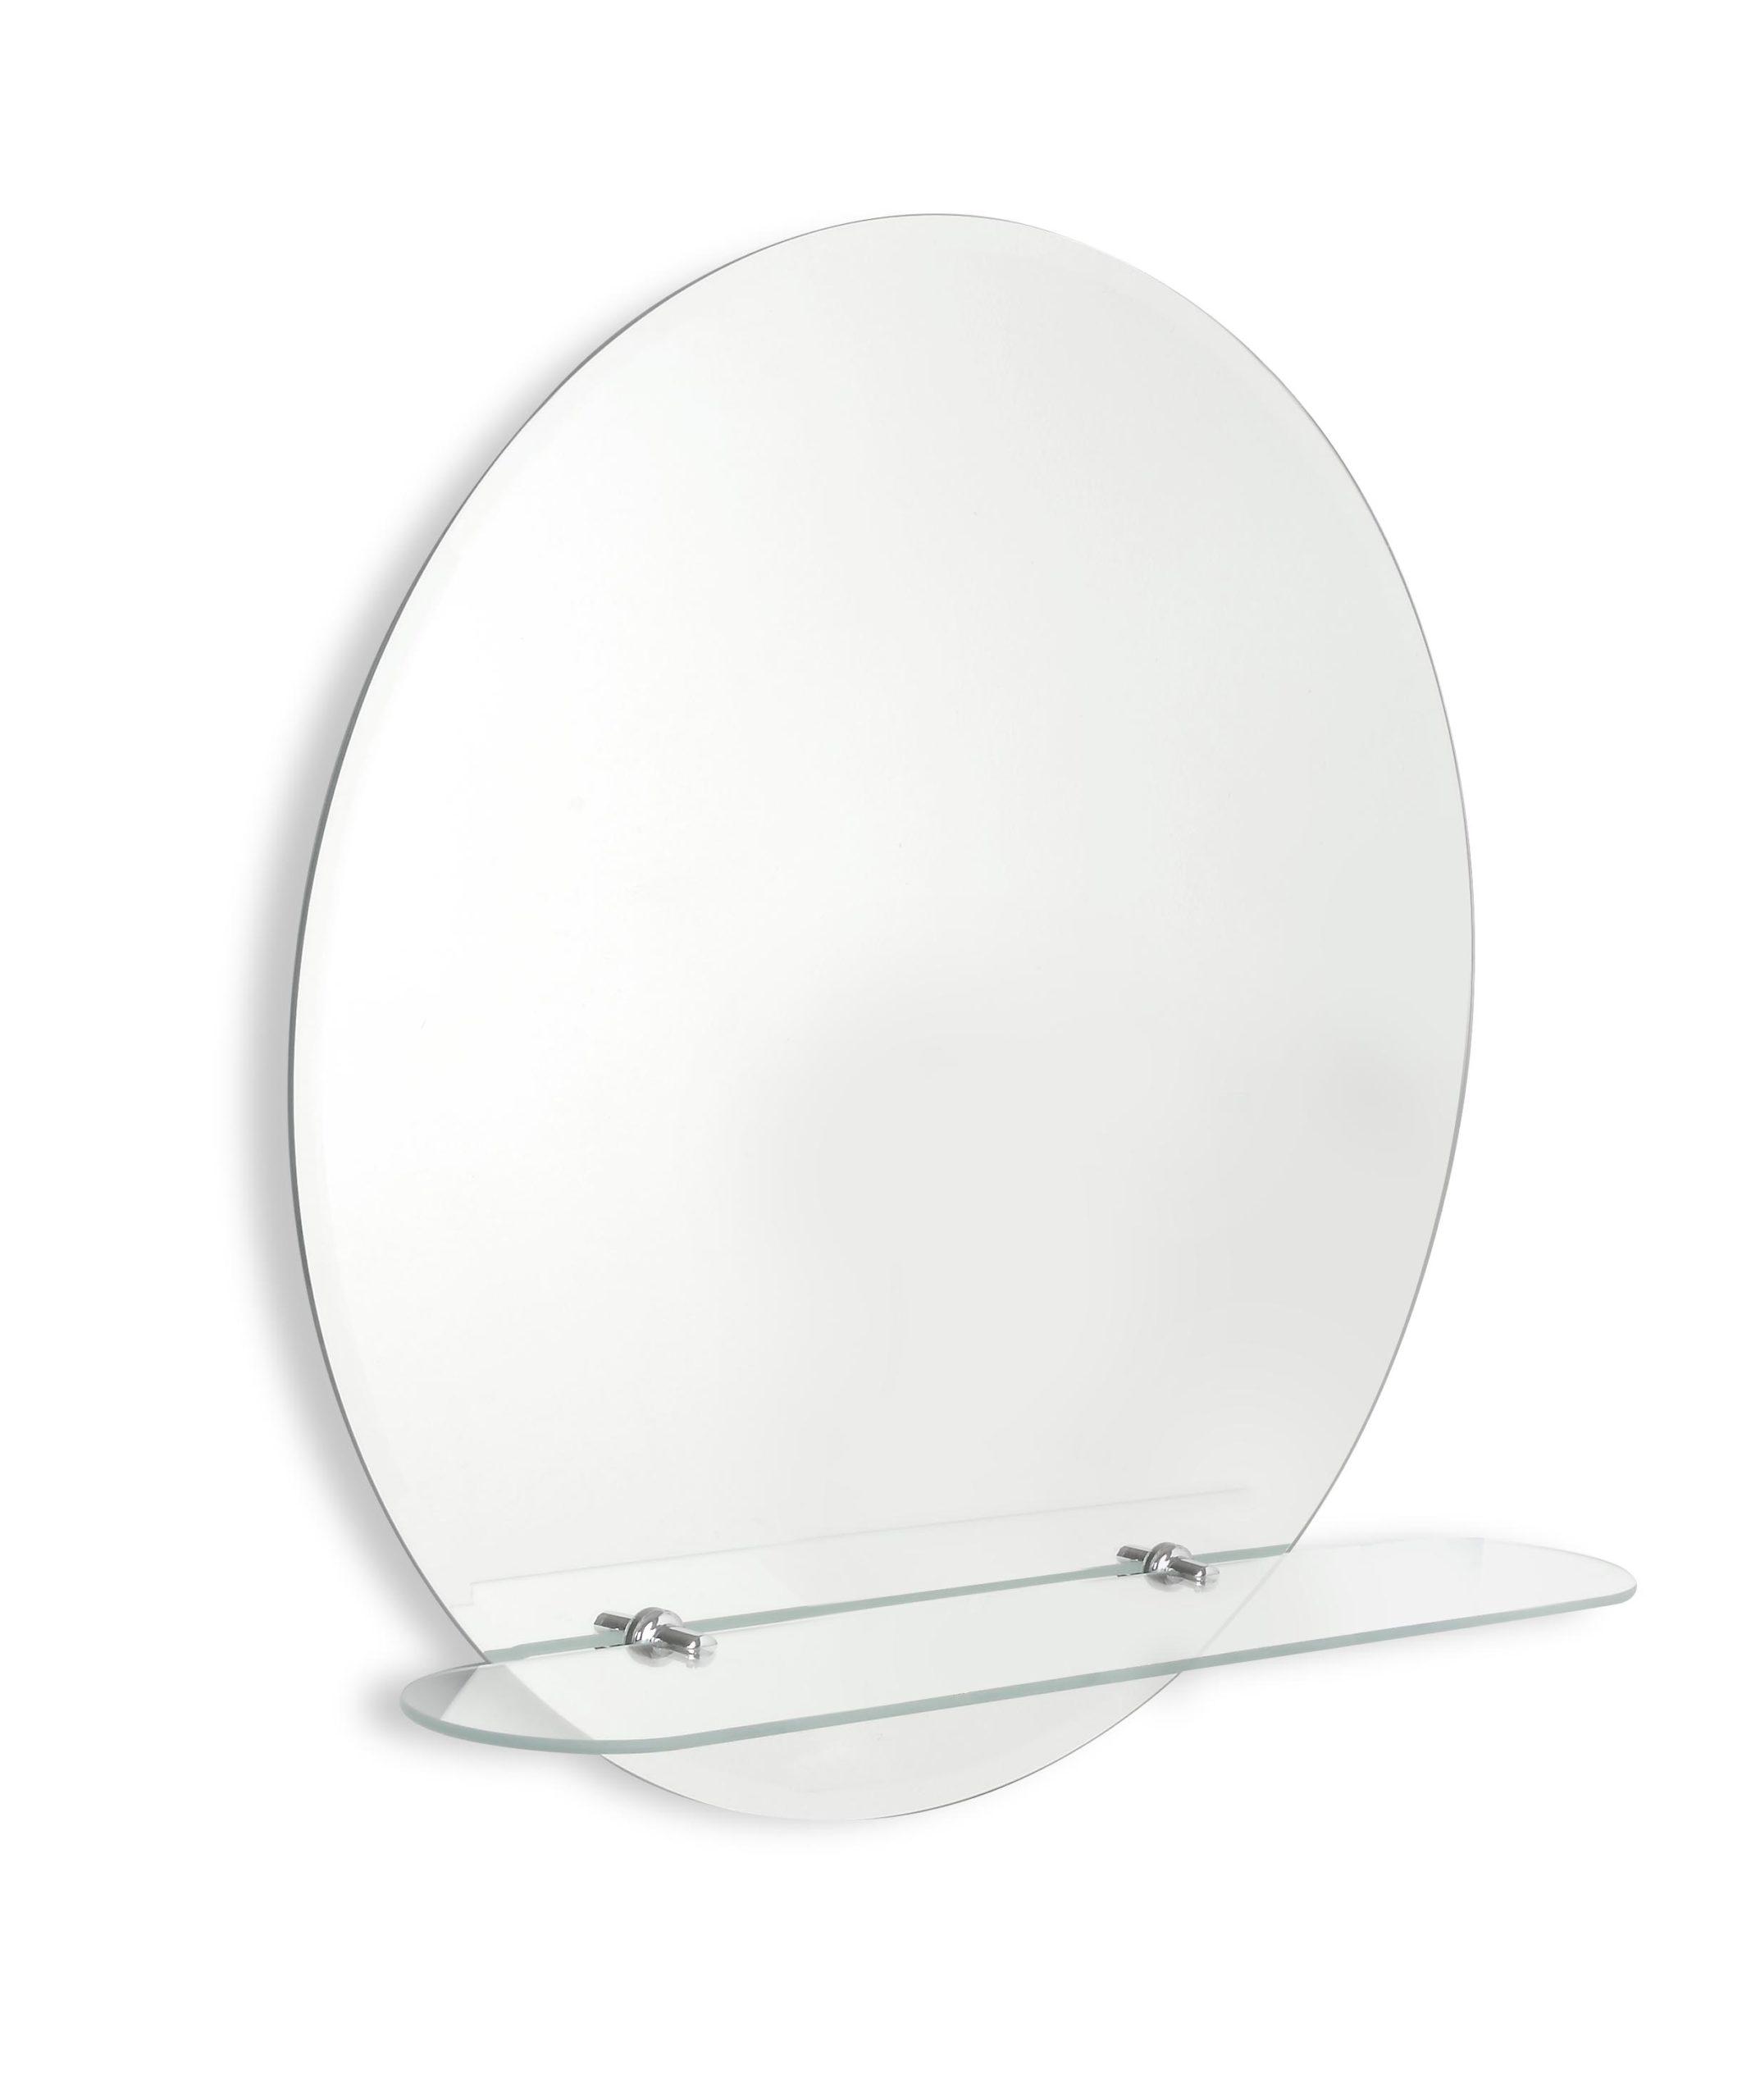 GEORGINA kulaté zrcadlo Ø 60 cm s fazetou a s poličkou zrcadla Amirro